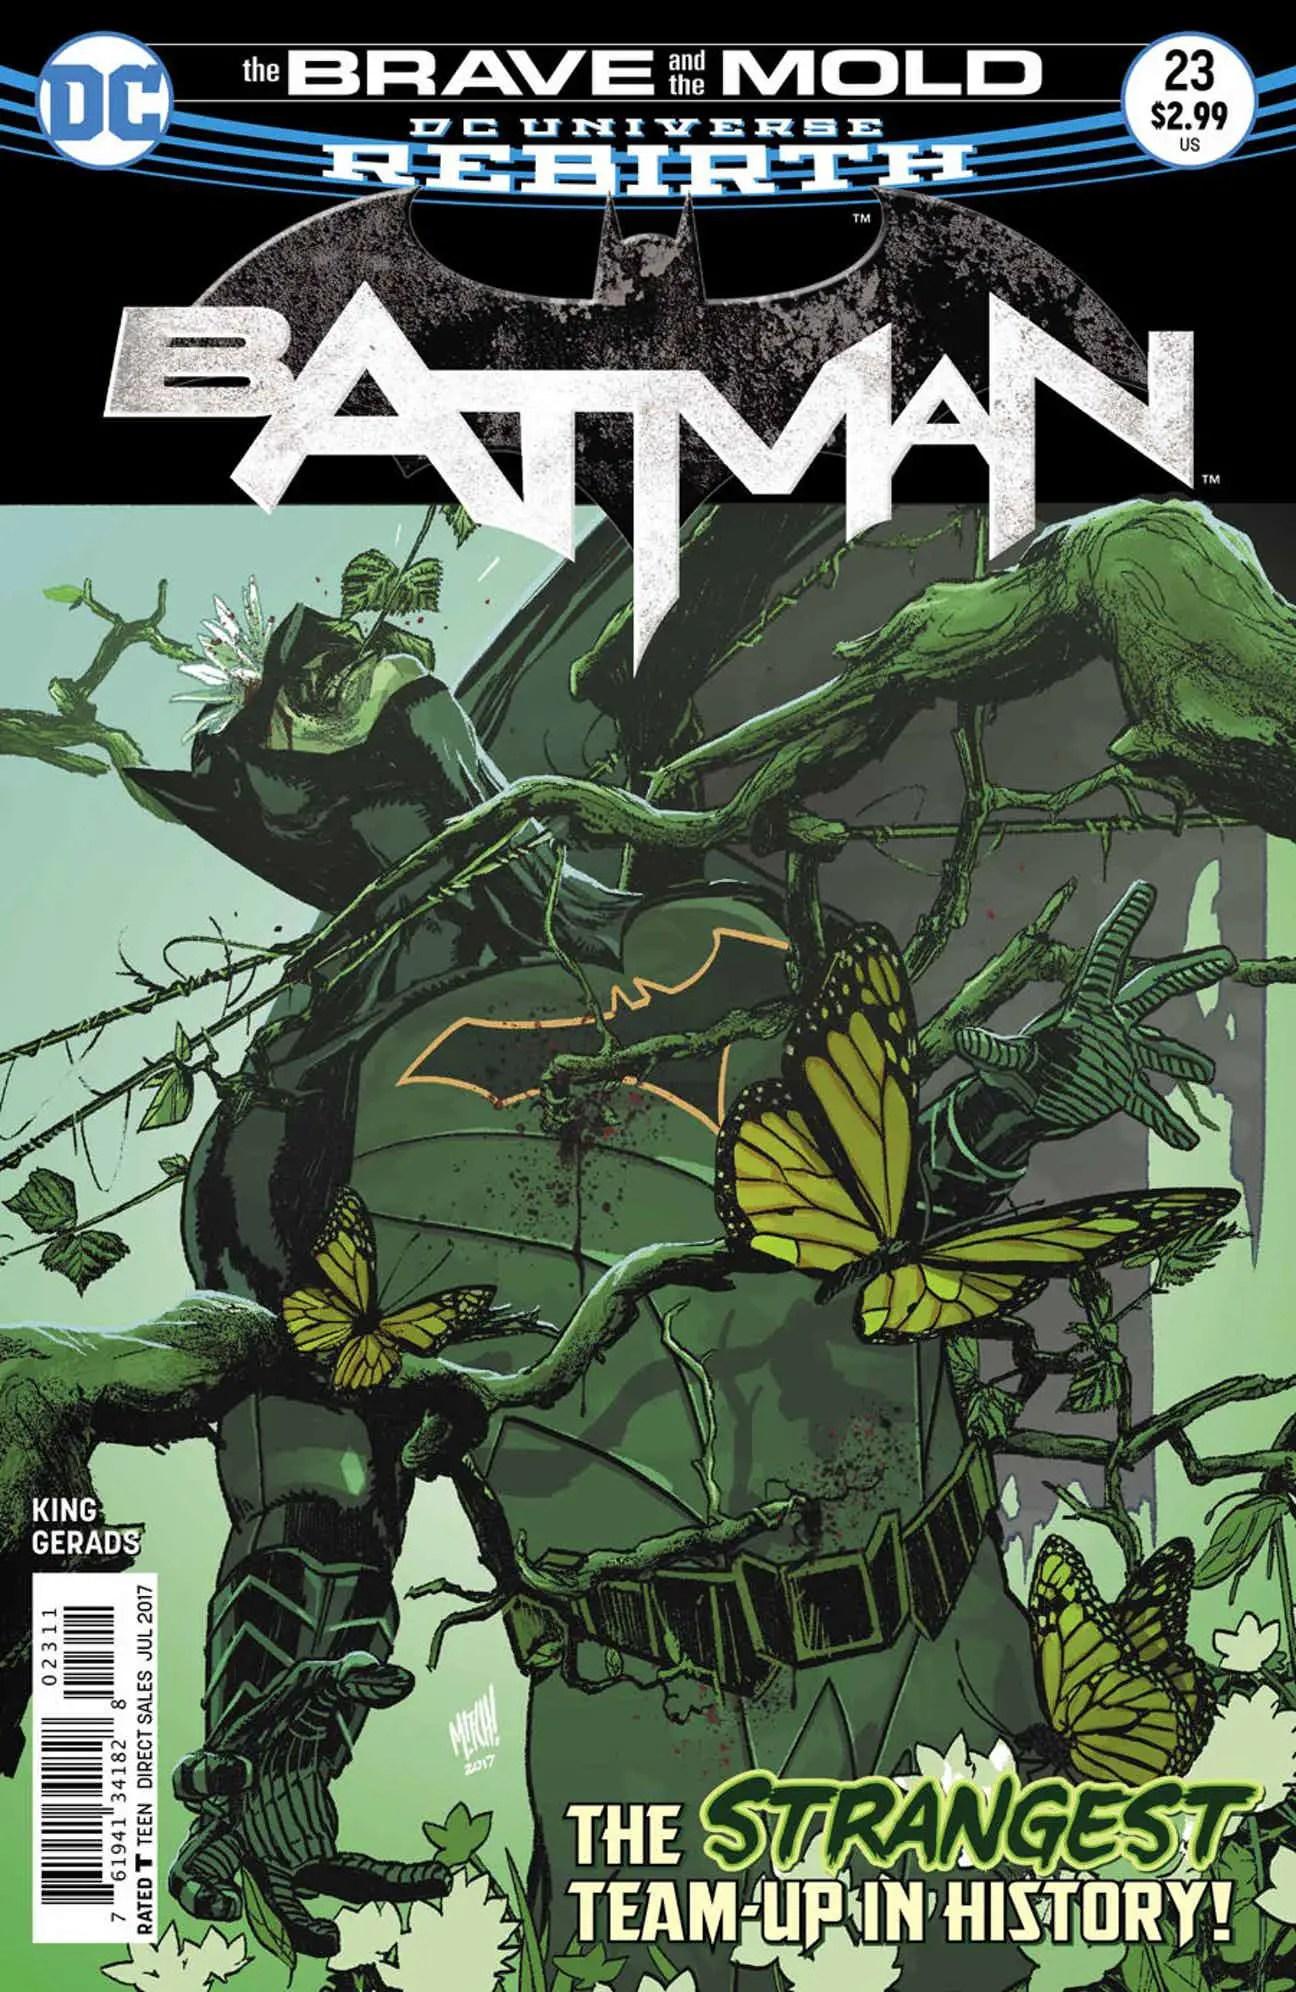 Batman #23 Review